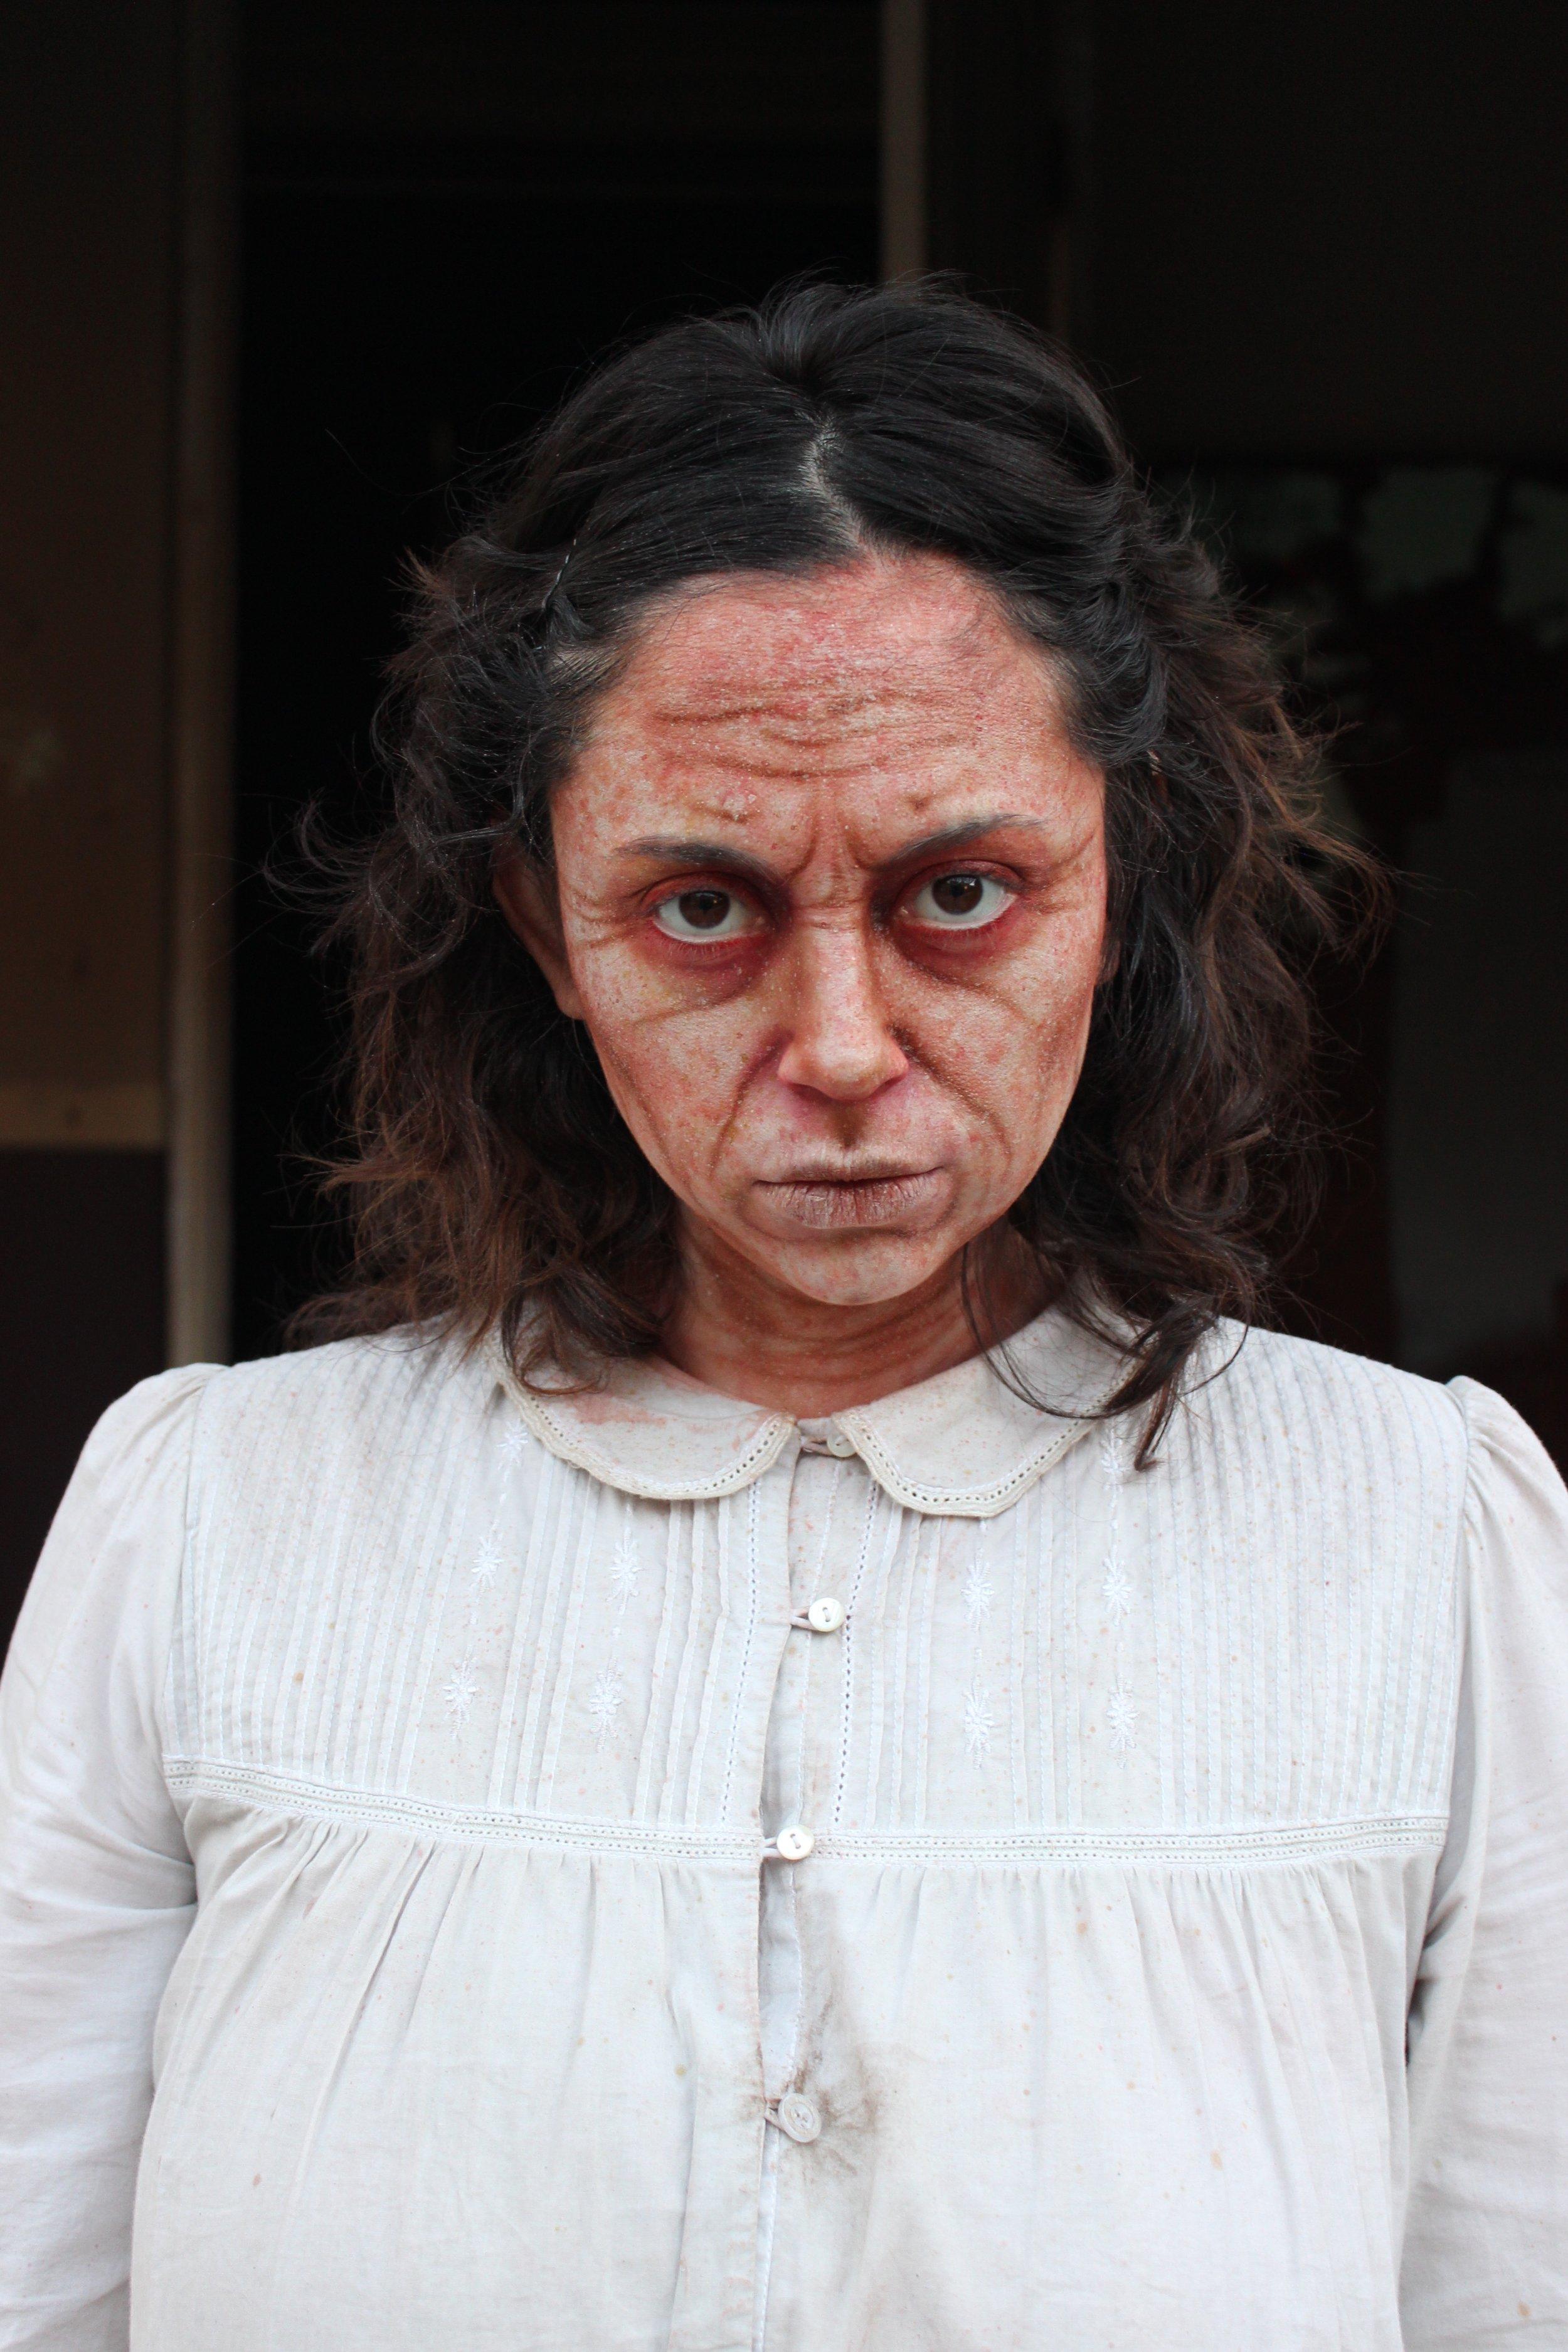 Warner Bros Studio Tour Hollywood- Horror Made Here, 2017  Production: Warner Bros Studios & Planet C  Makeup Dept. Head: David Wooddruff  Actress: Maxine Brumer  Makeup provided by EBA Performance Makeup